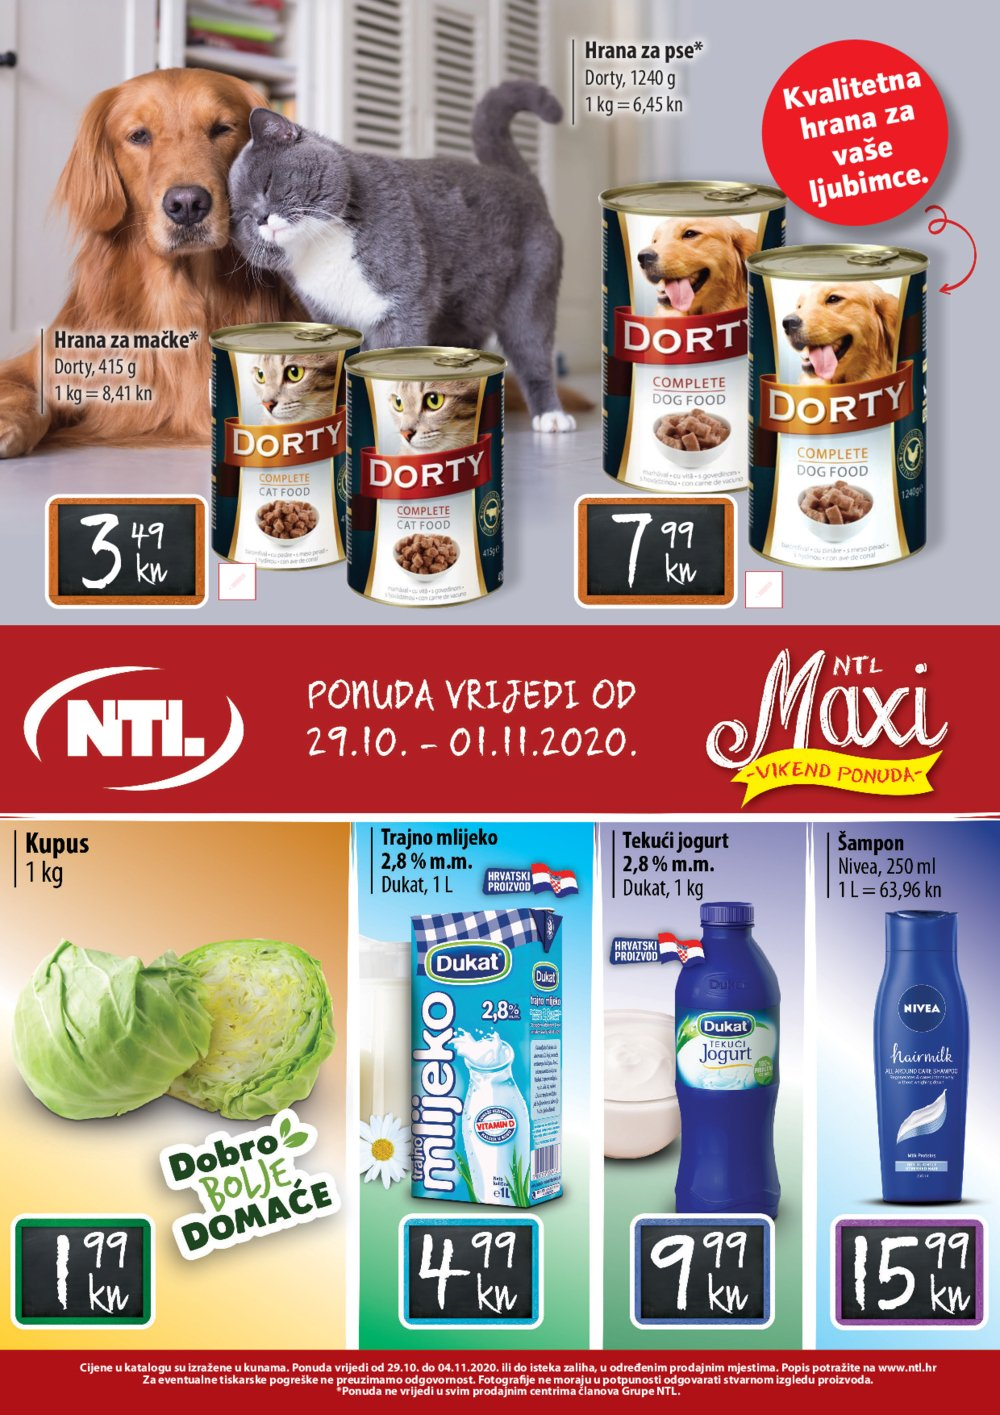 Trgovina Krk katalog NTL Maxi Tjedna ponuda 29.10.-04.11.2020.